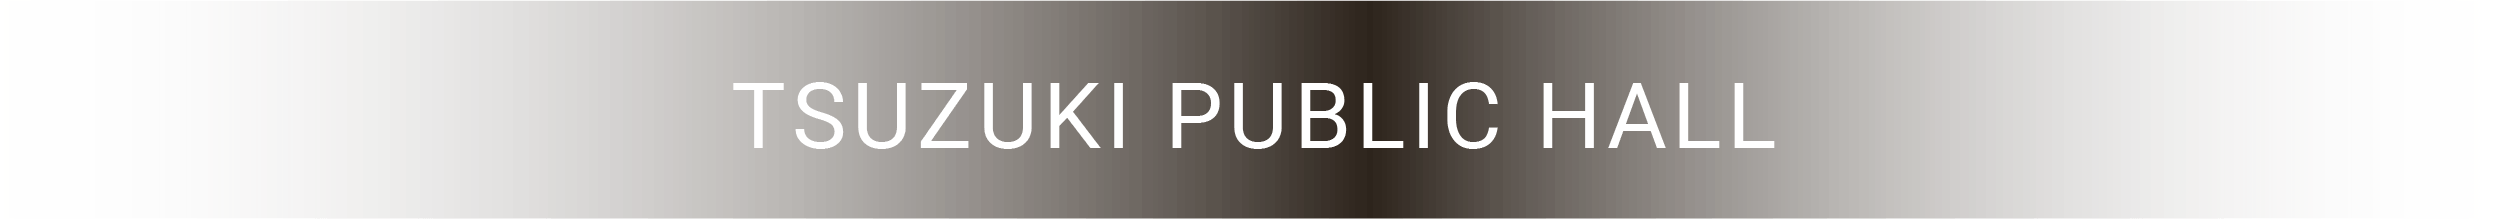 TSUZUKI PUBLIC HALL